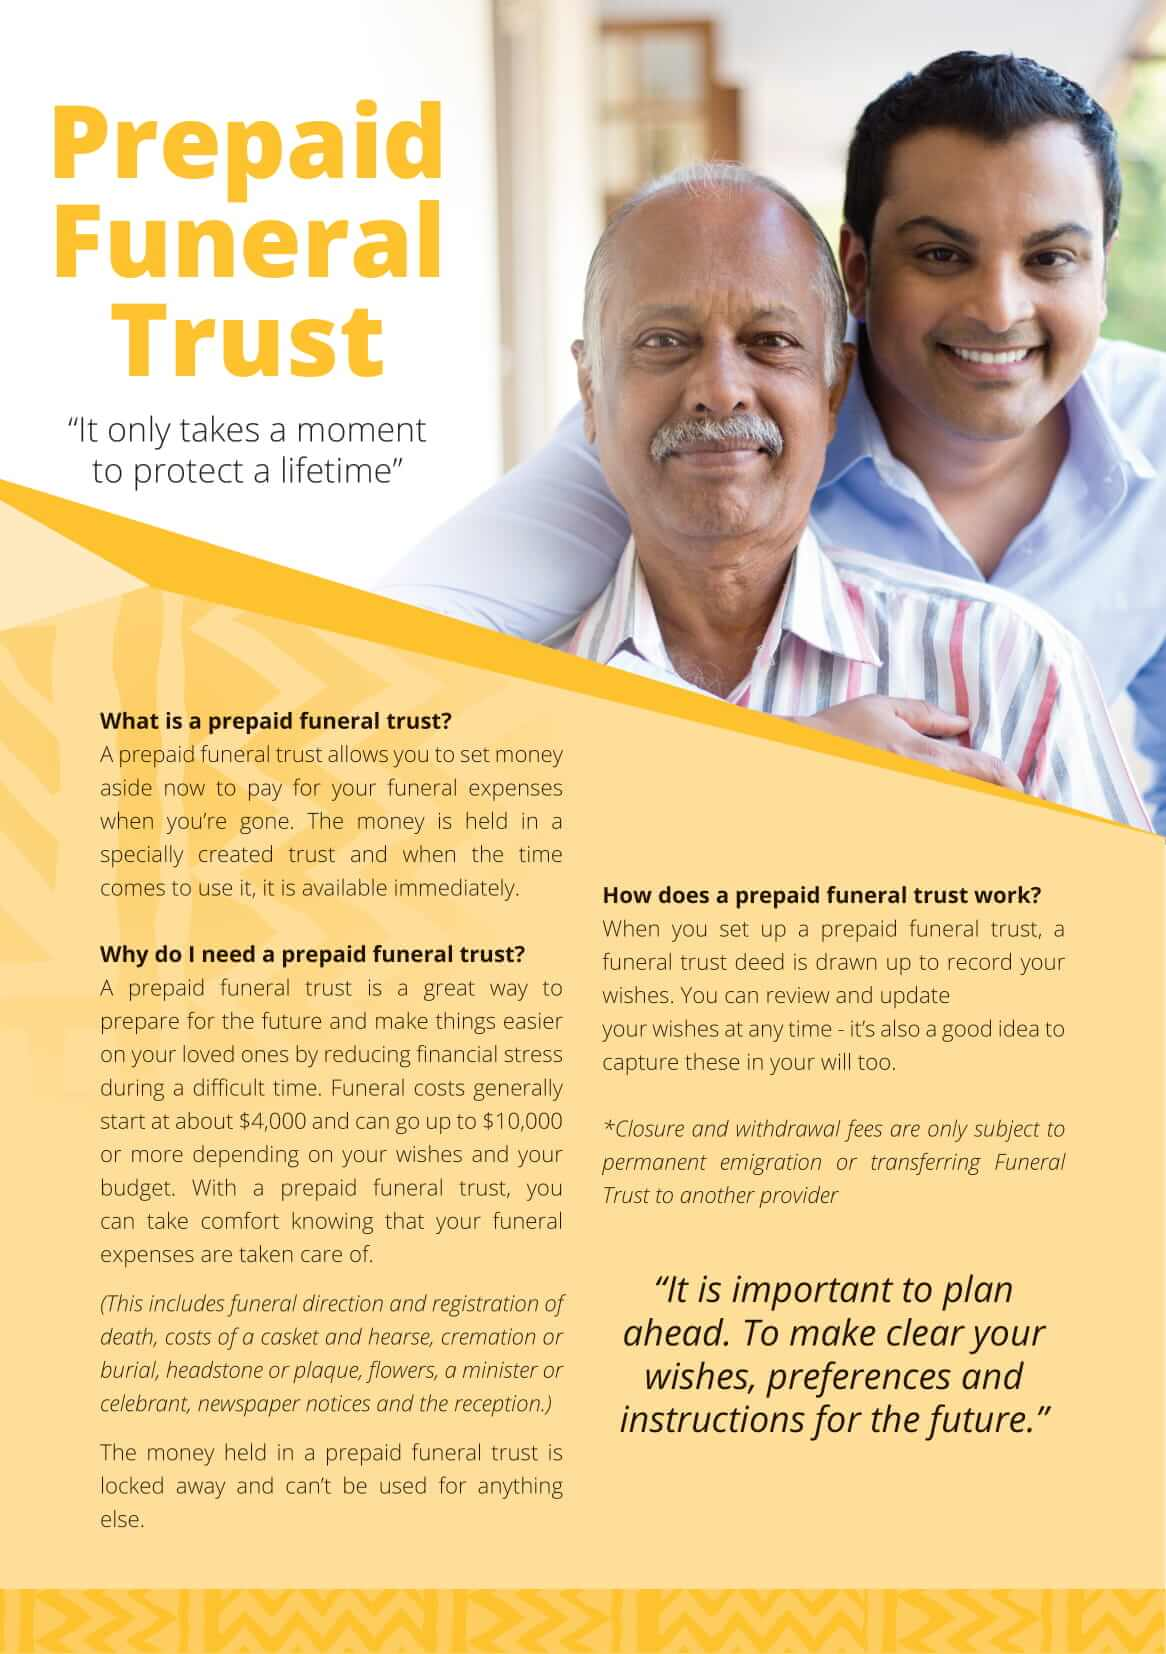 Prepaid Funeral Trust